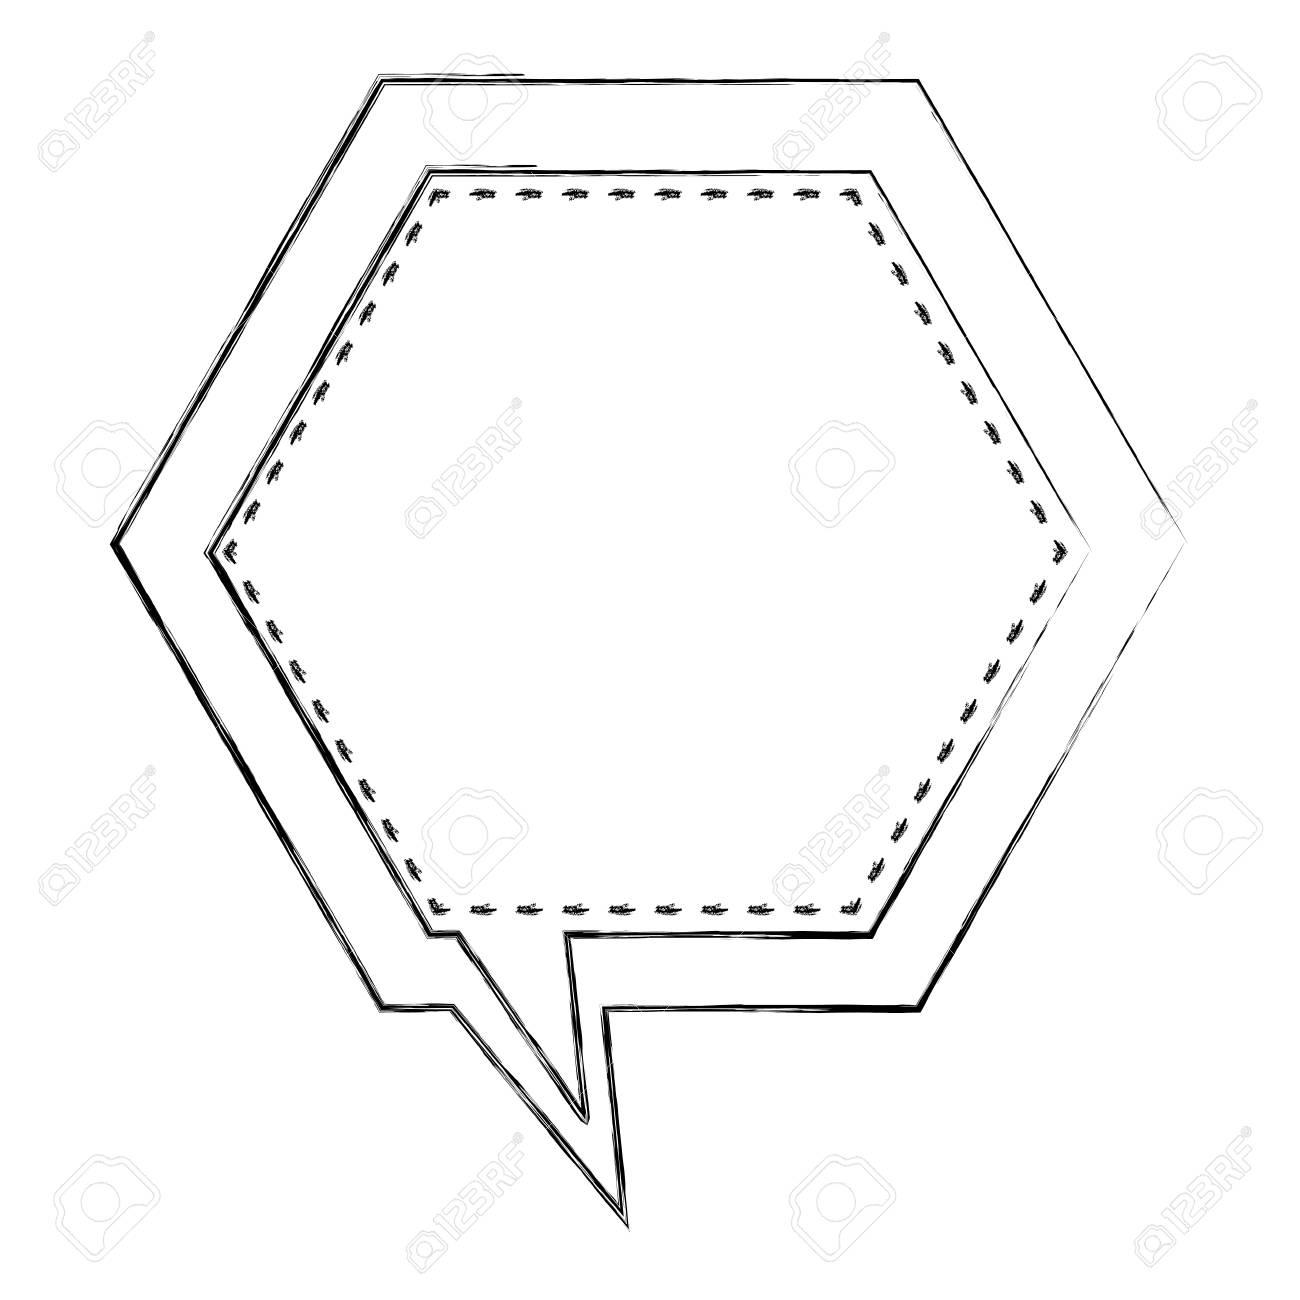 Monochrome Blurred Contour Of Hexagon Frame Callout Dialogue ...